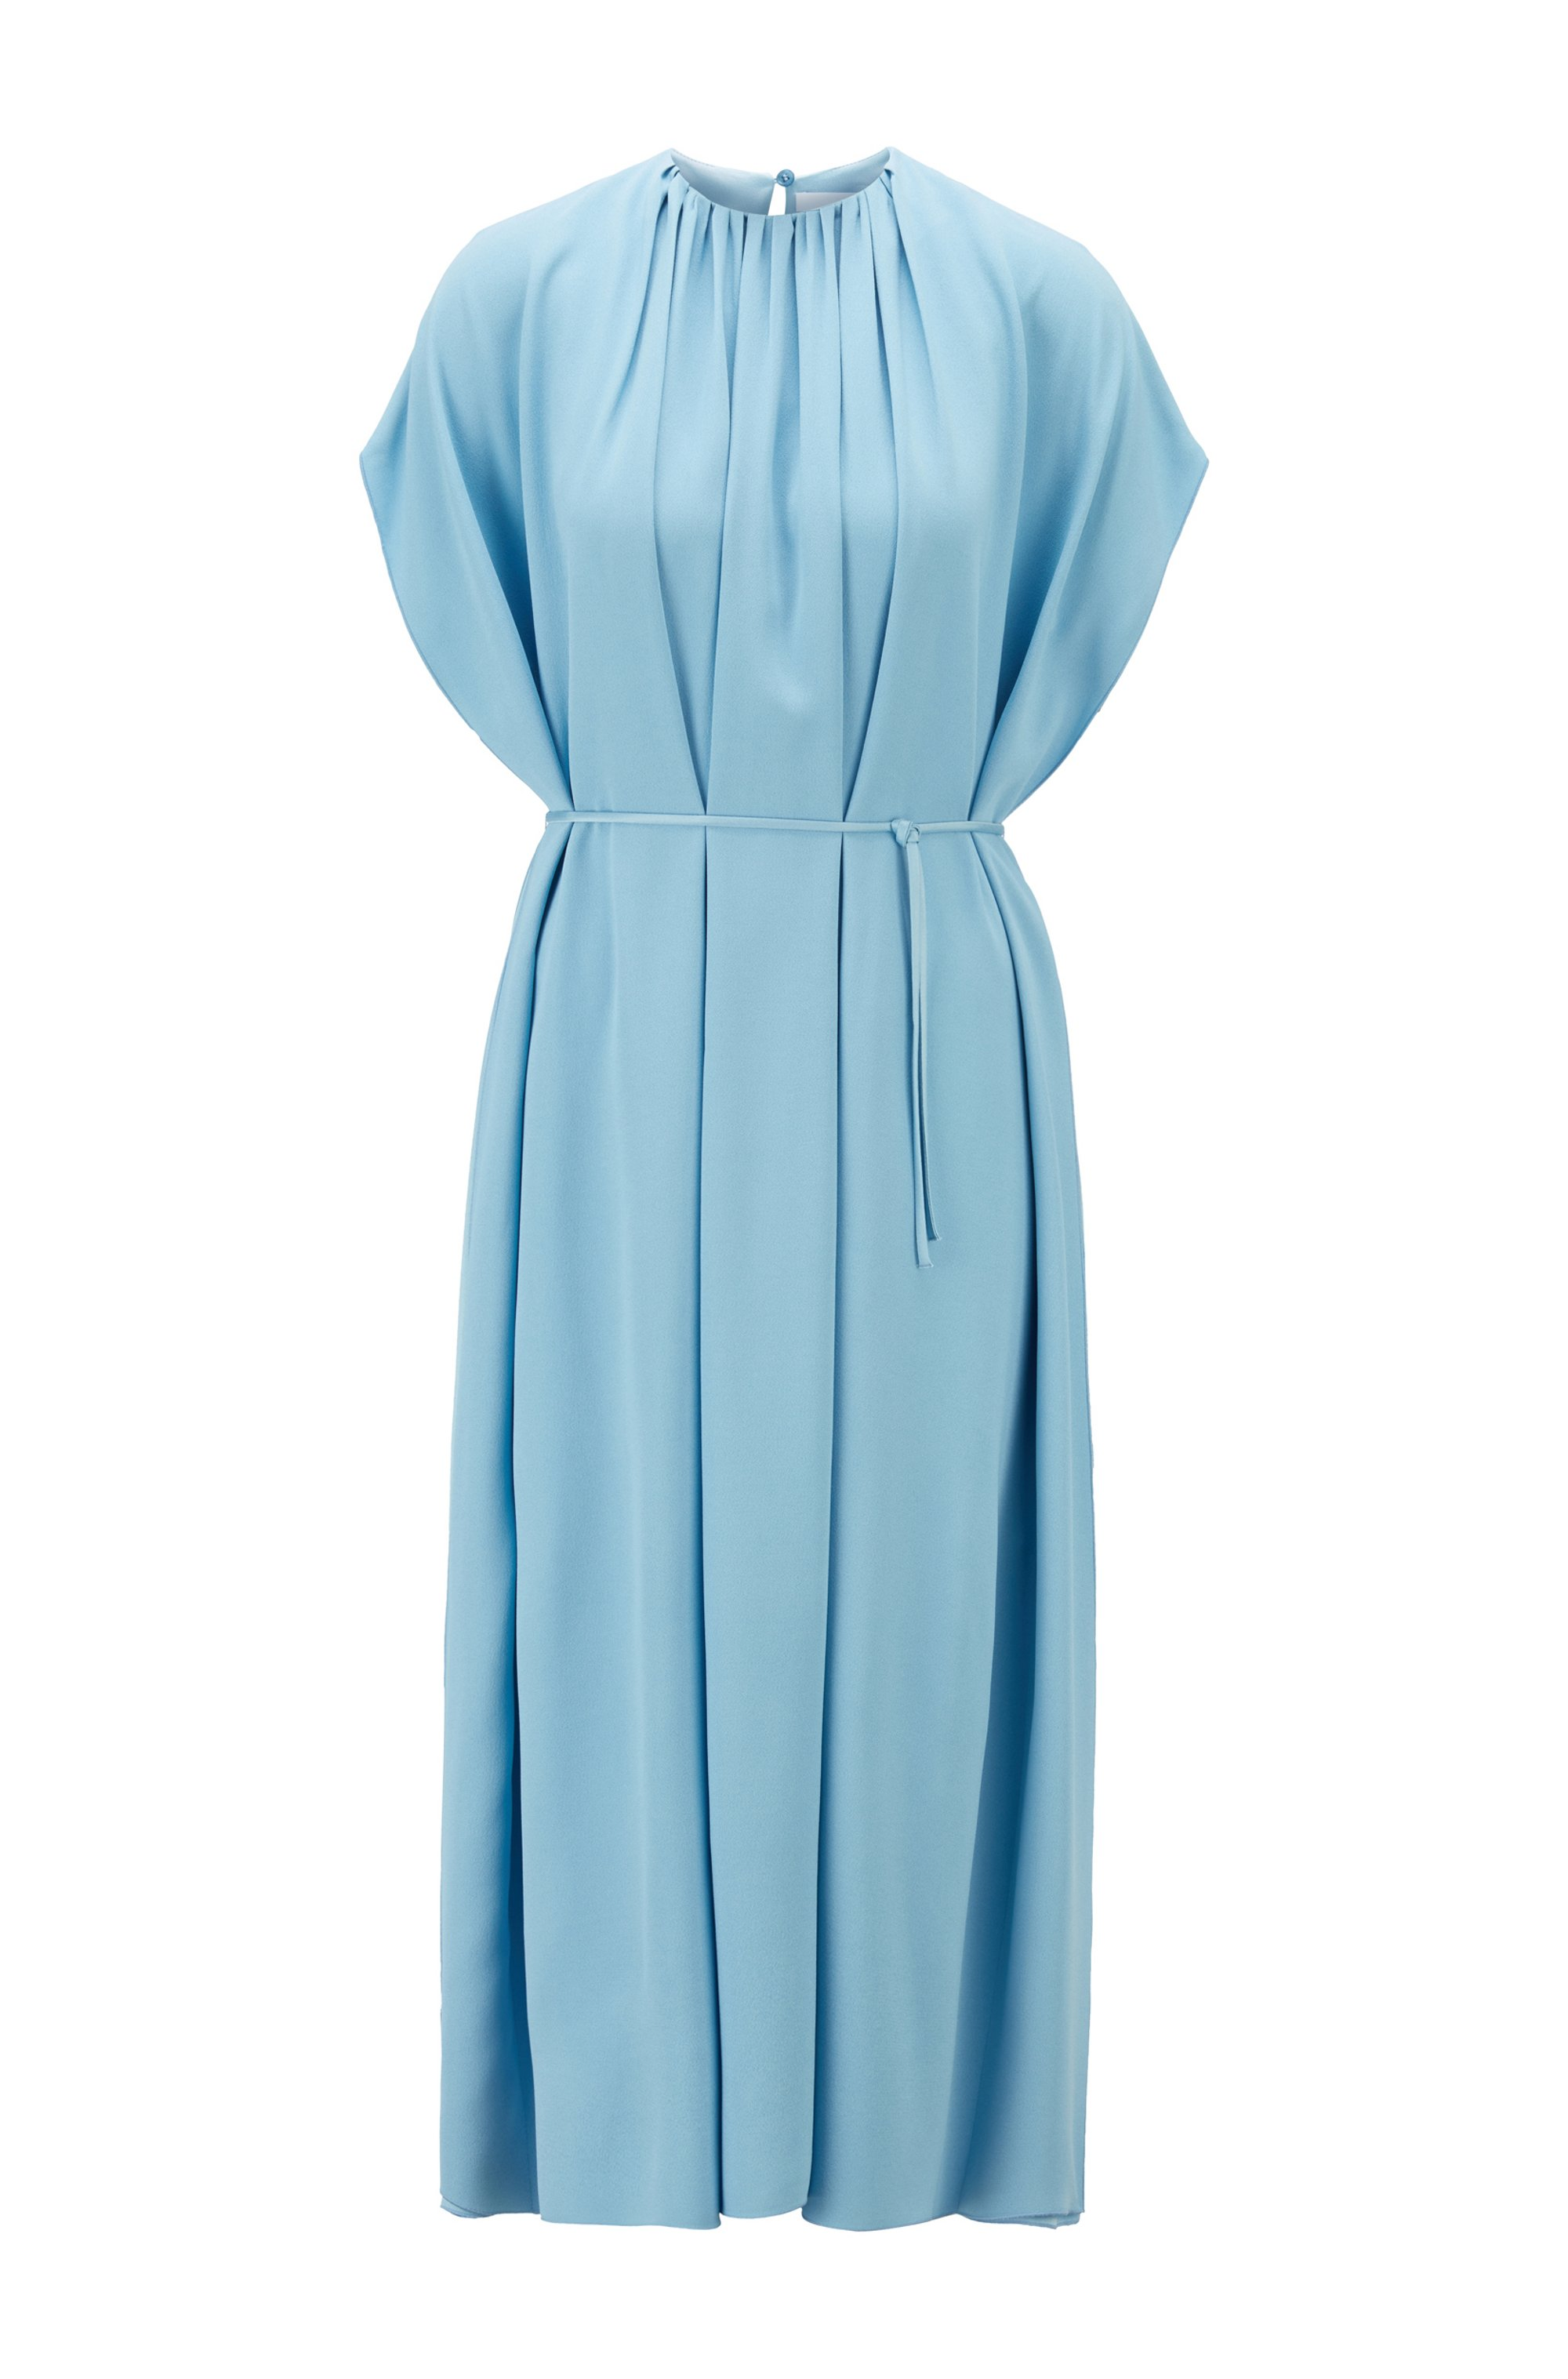 Kimono-sleeve dress in satin-back crepe, Light Blue